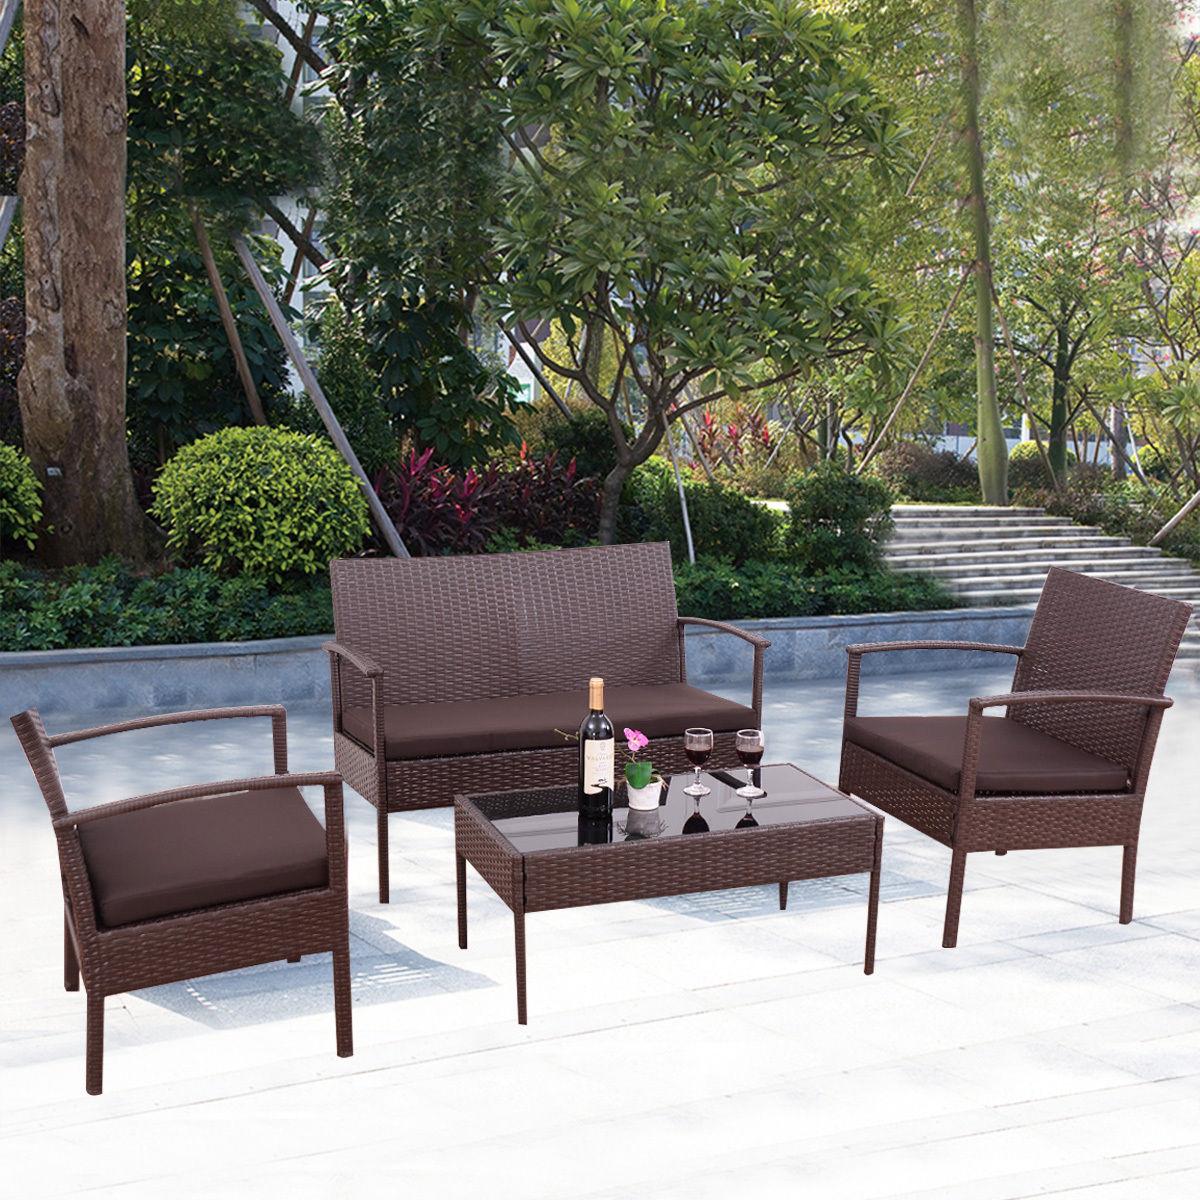 4Pc Patio Rattan Wicker Furniture Set: $120 AC + Free Shipping $119.99